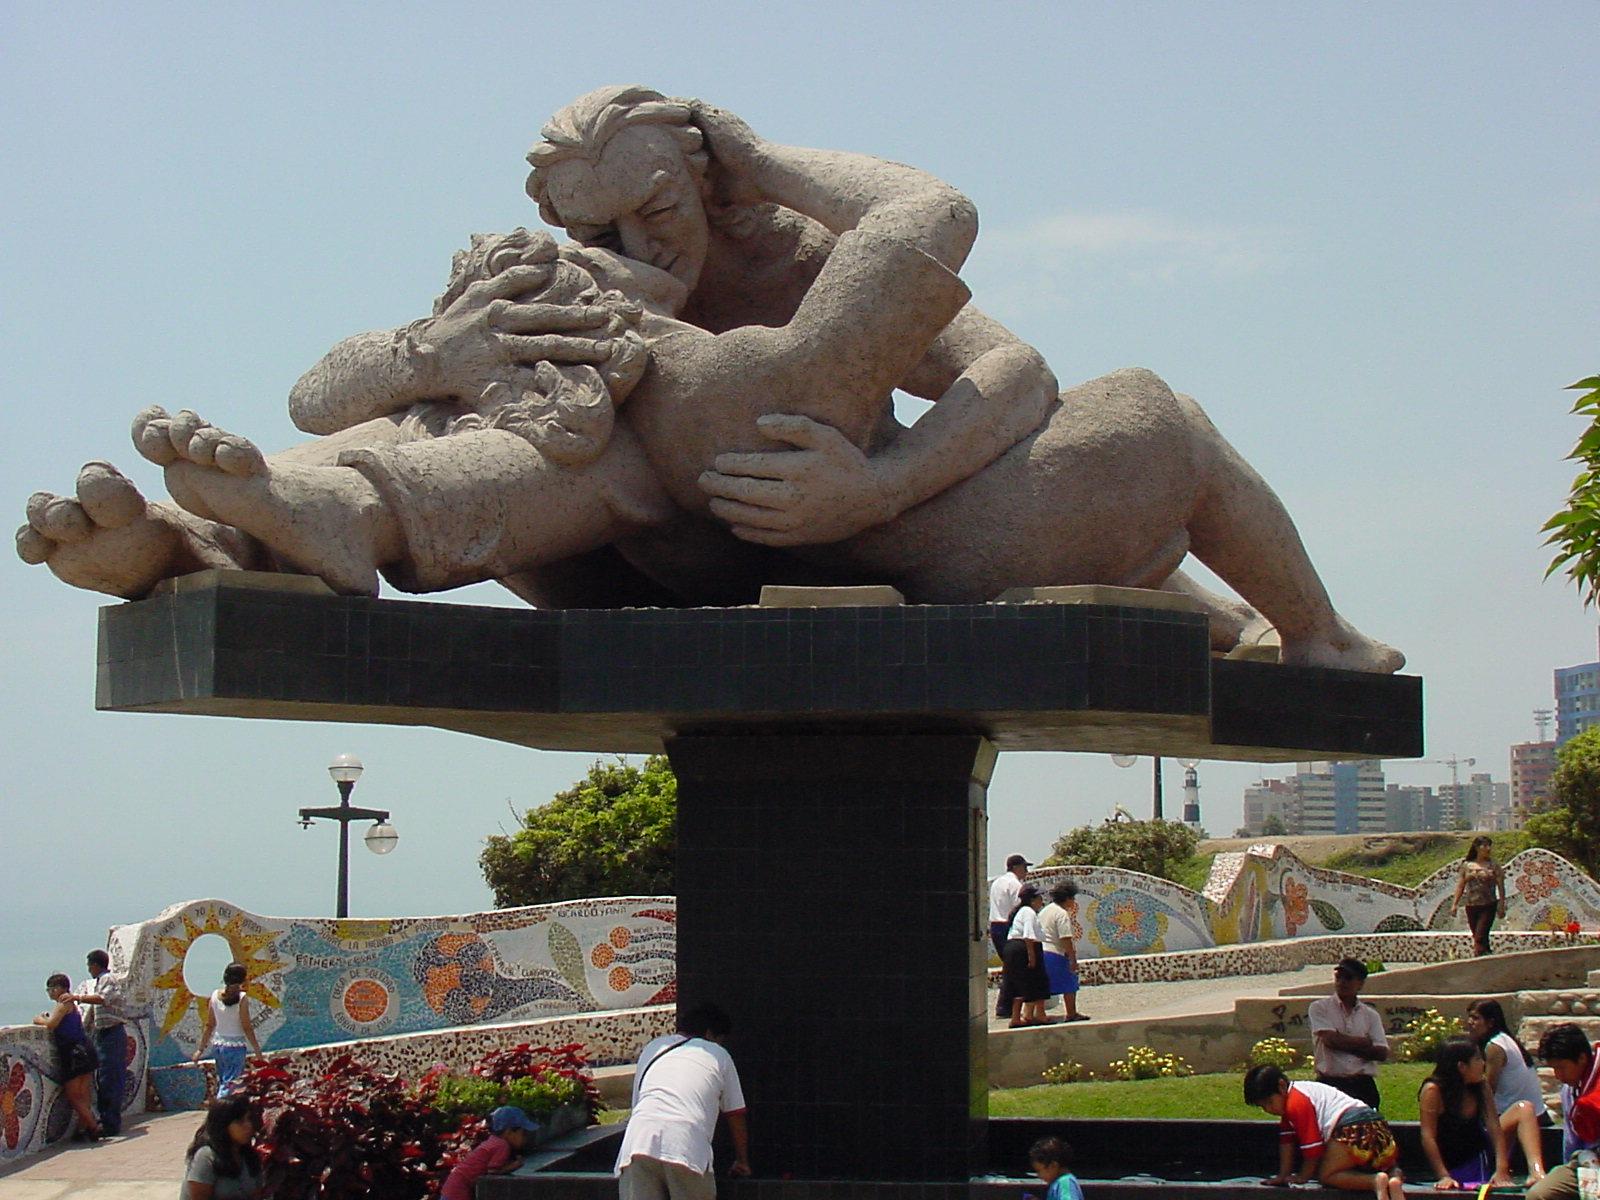 close-up Parque del Amor